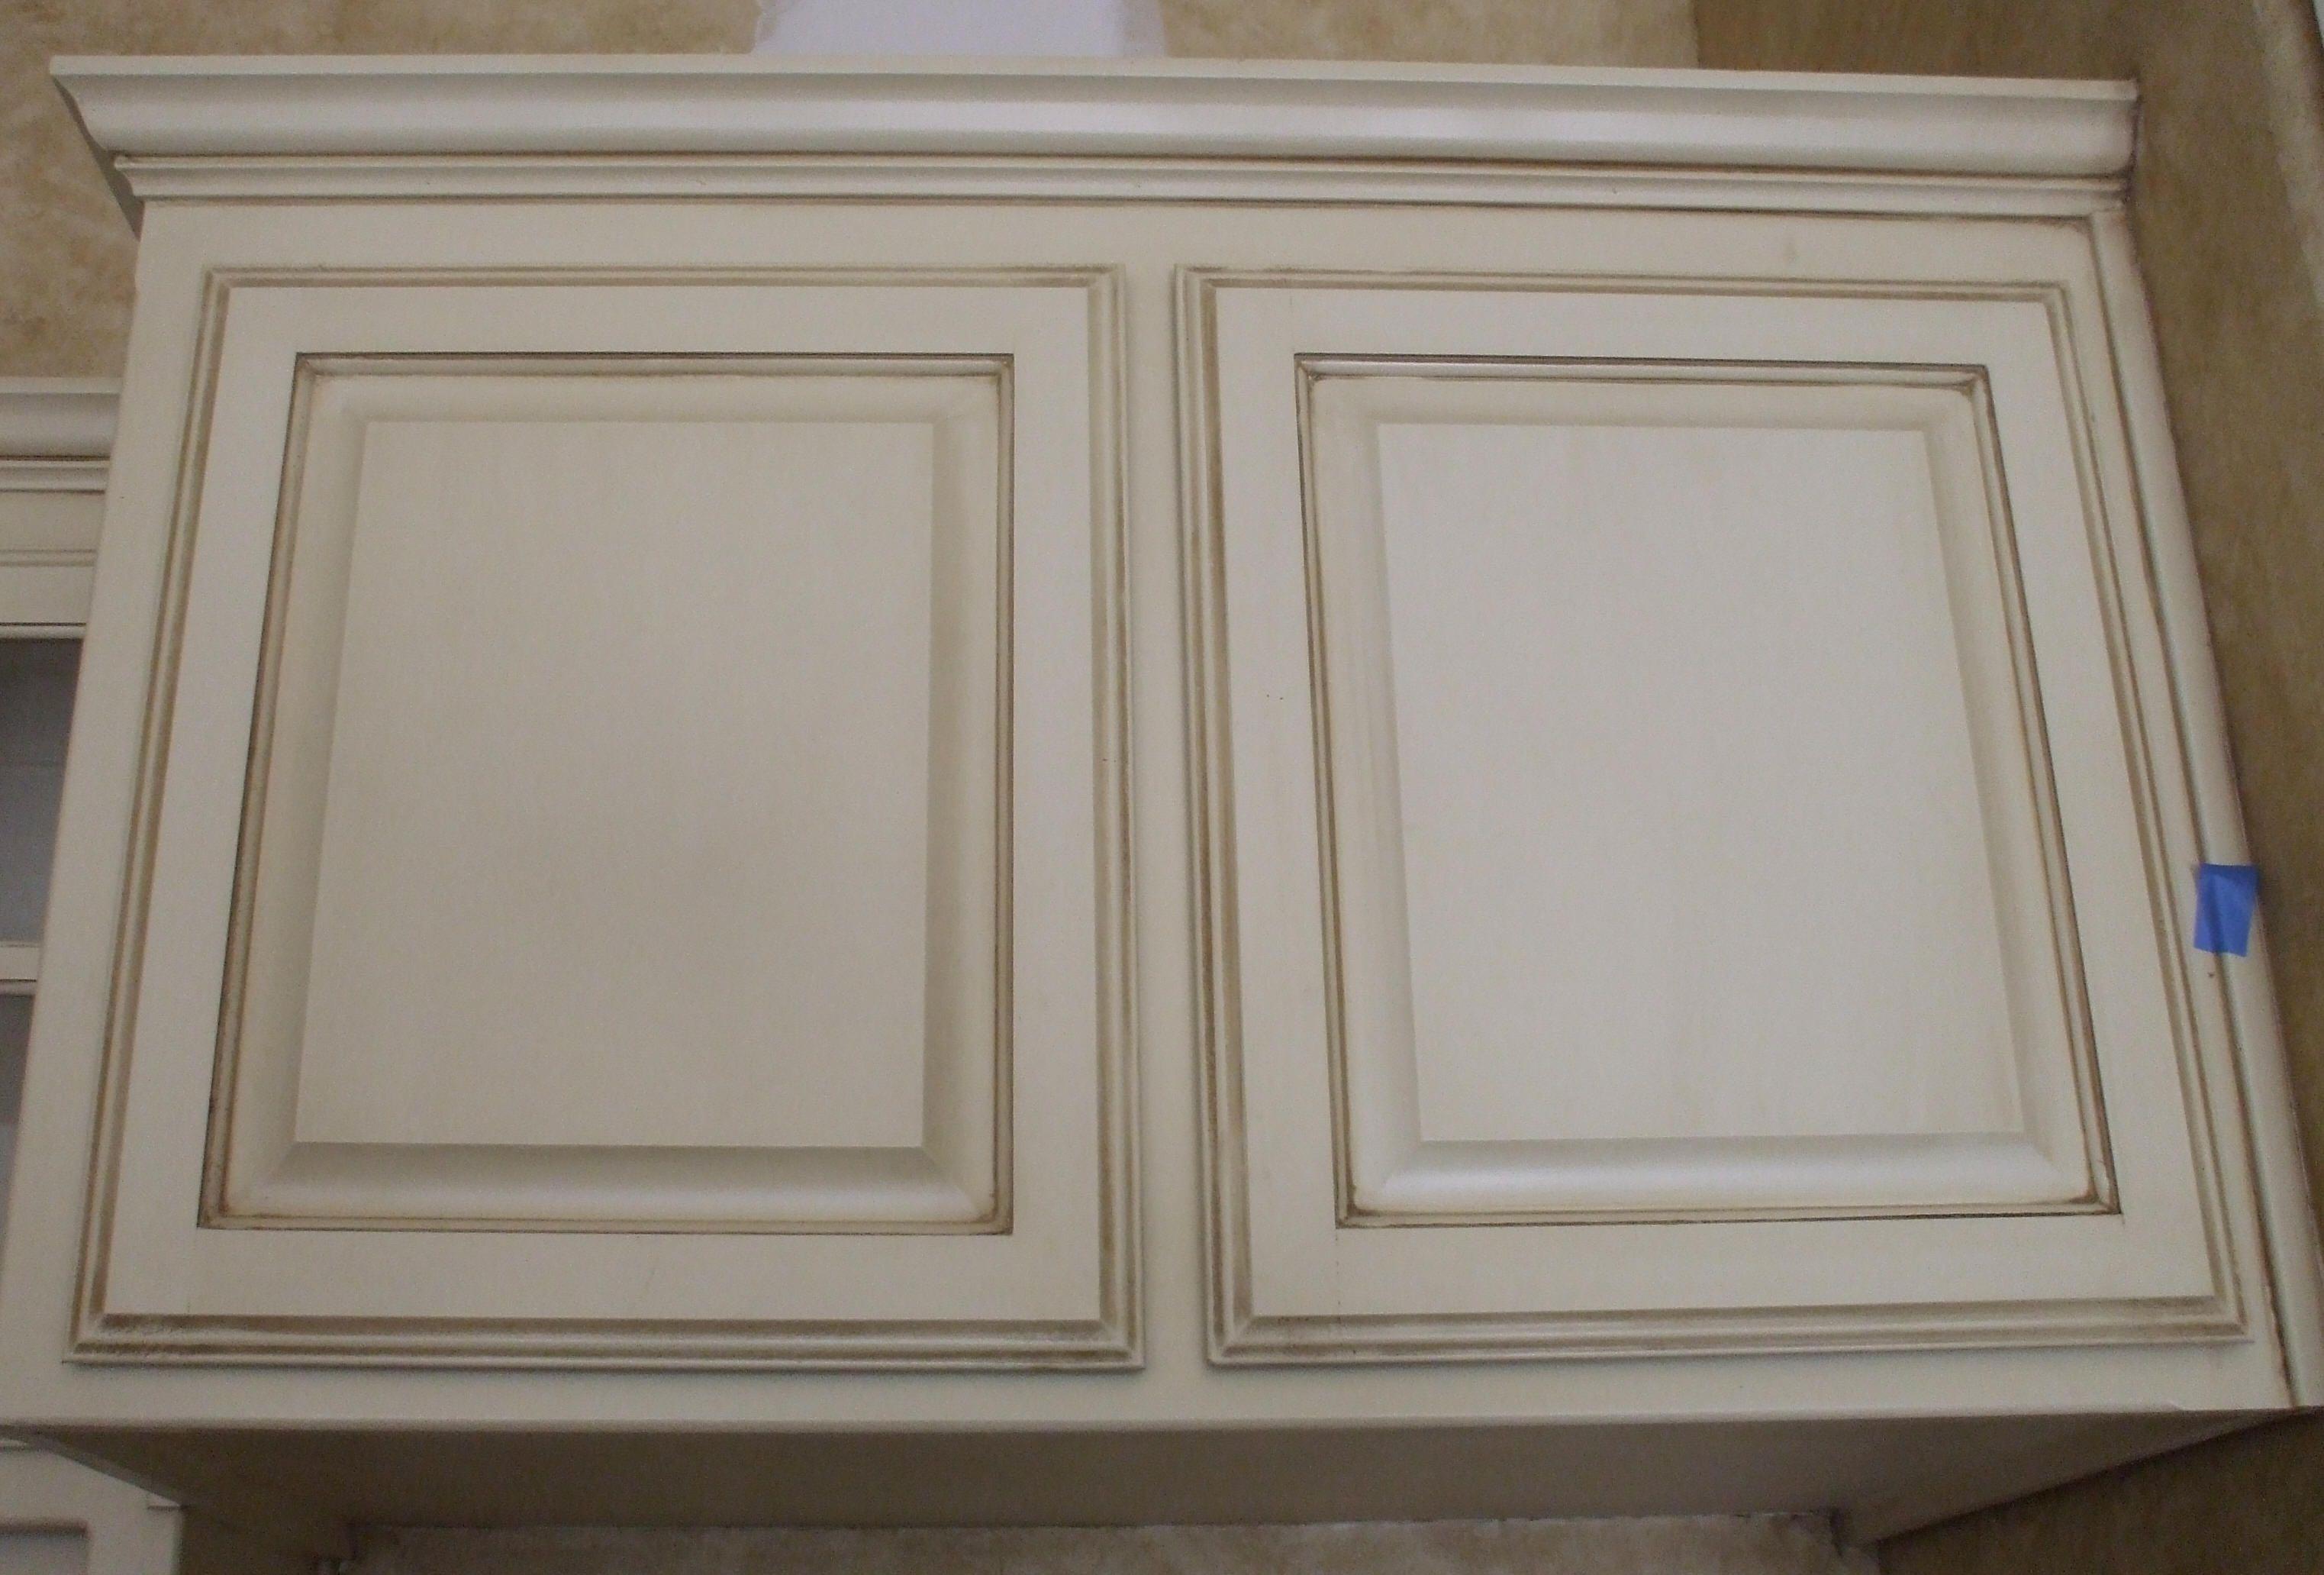 Faux Finish Kitchen Canet Photos Kitchen Designs Glazed Kitchen Cabinets Antique White Kitchen Painting Kitchen Cabinets